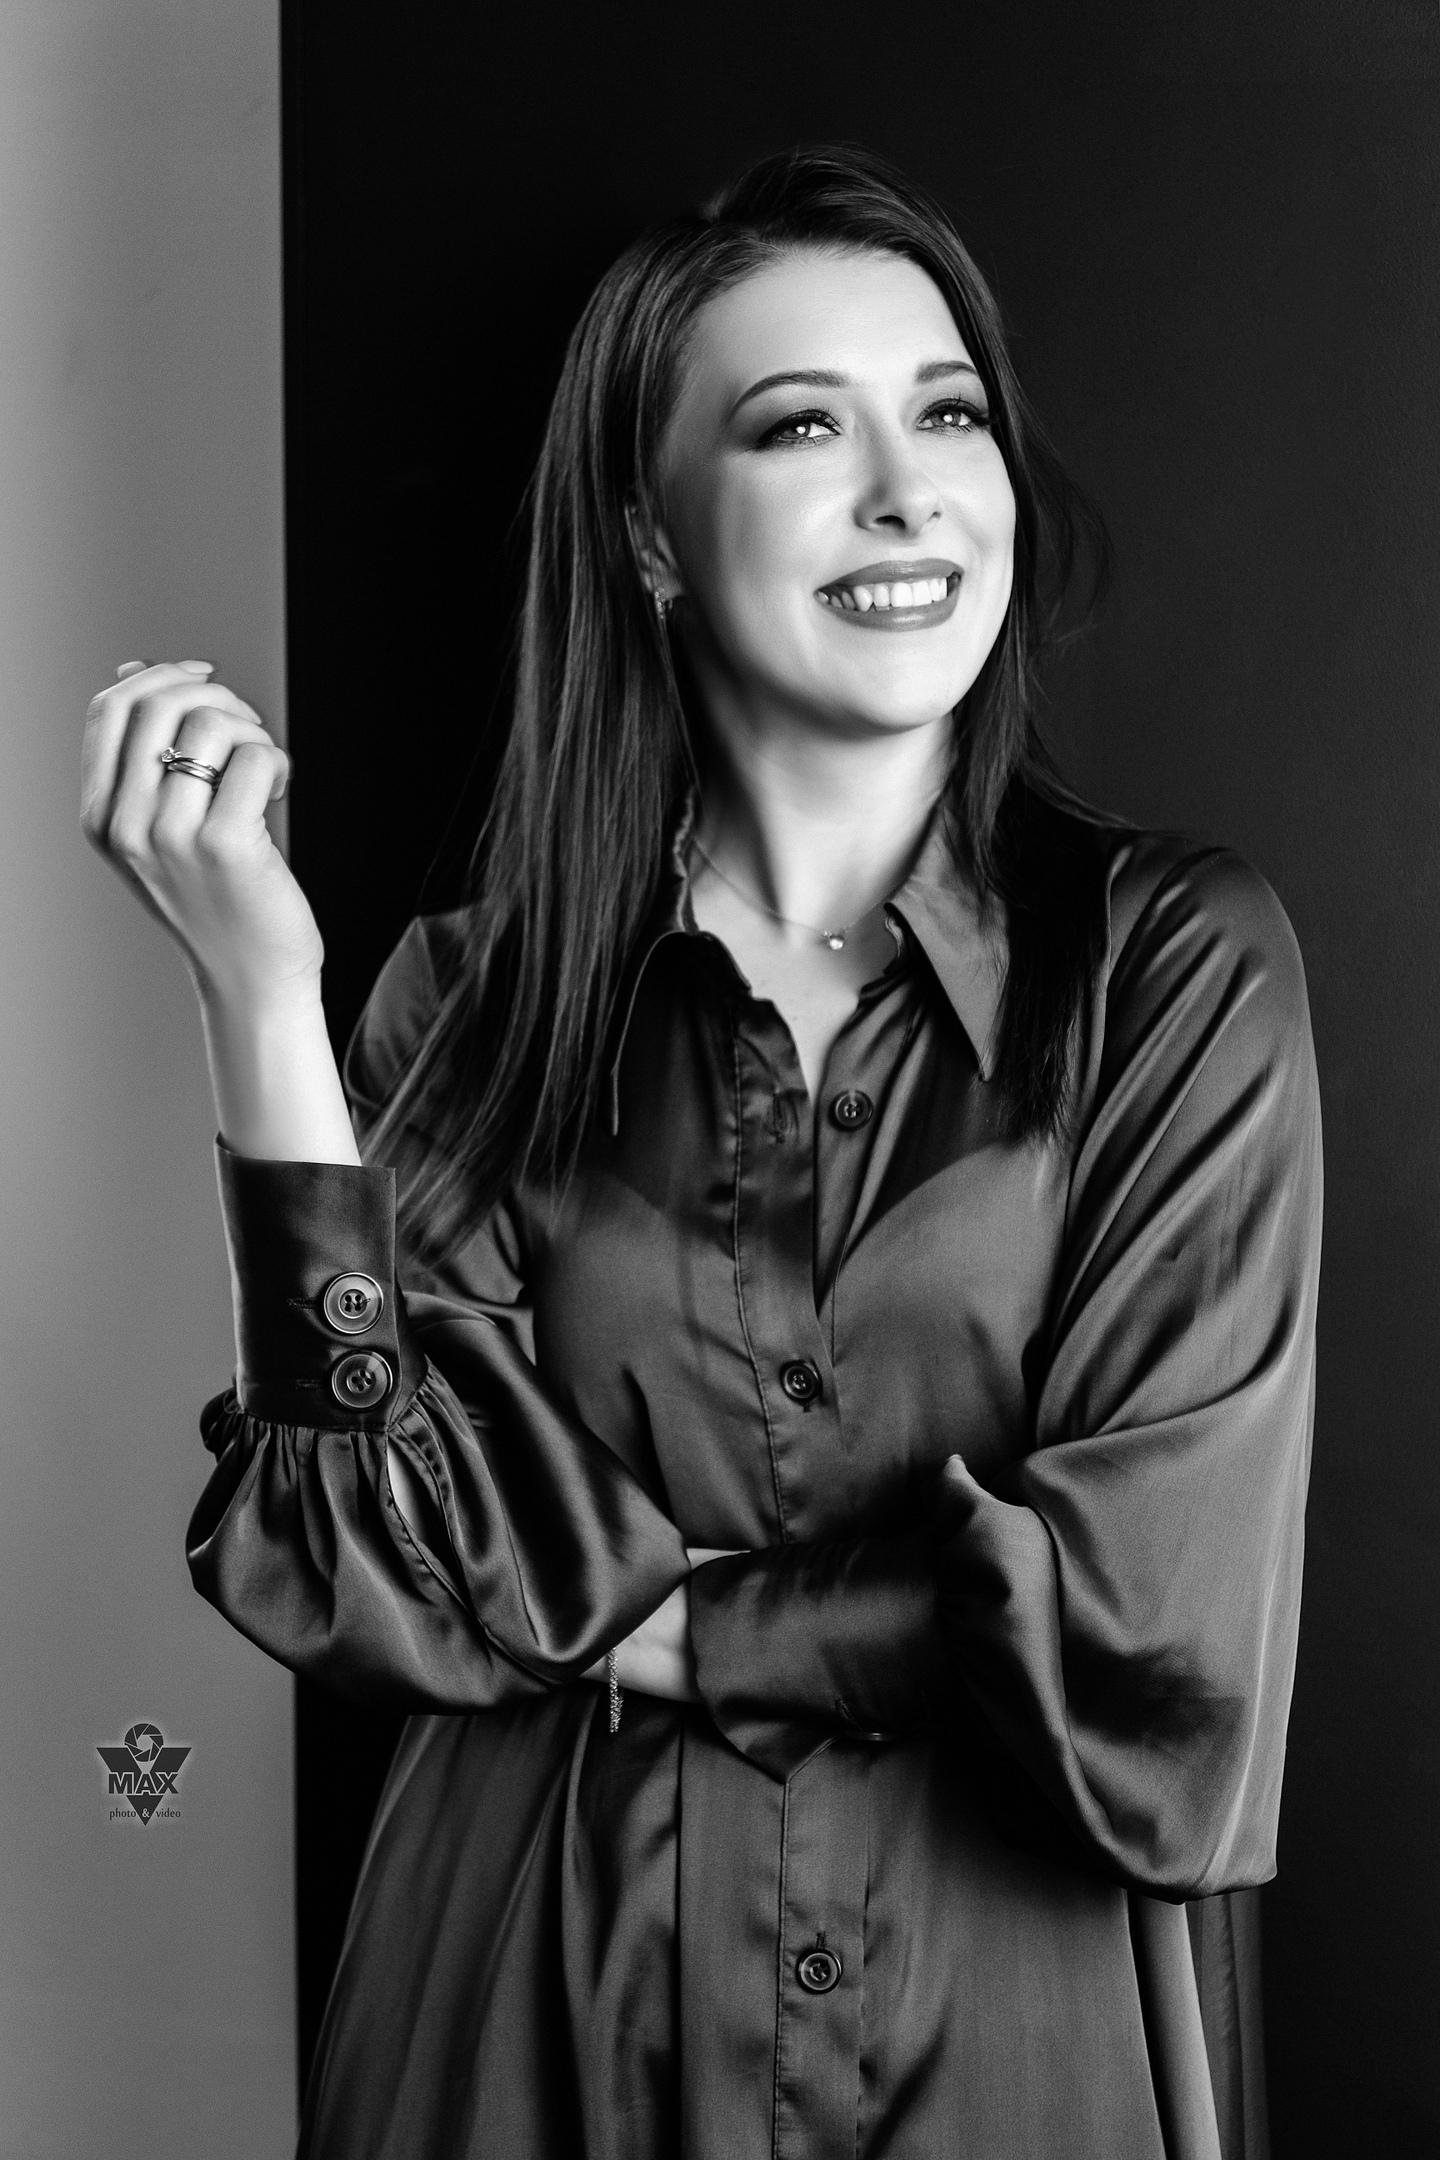 Екатерина Боброва - Дмитрий Соловьев - 2 - Страница 36 OEDy2k-X30c